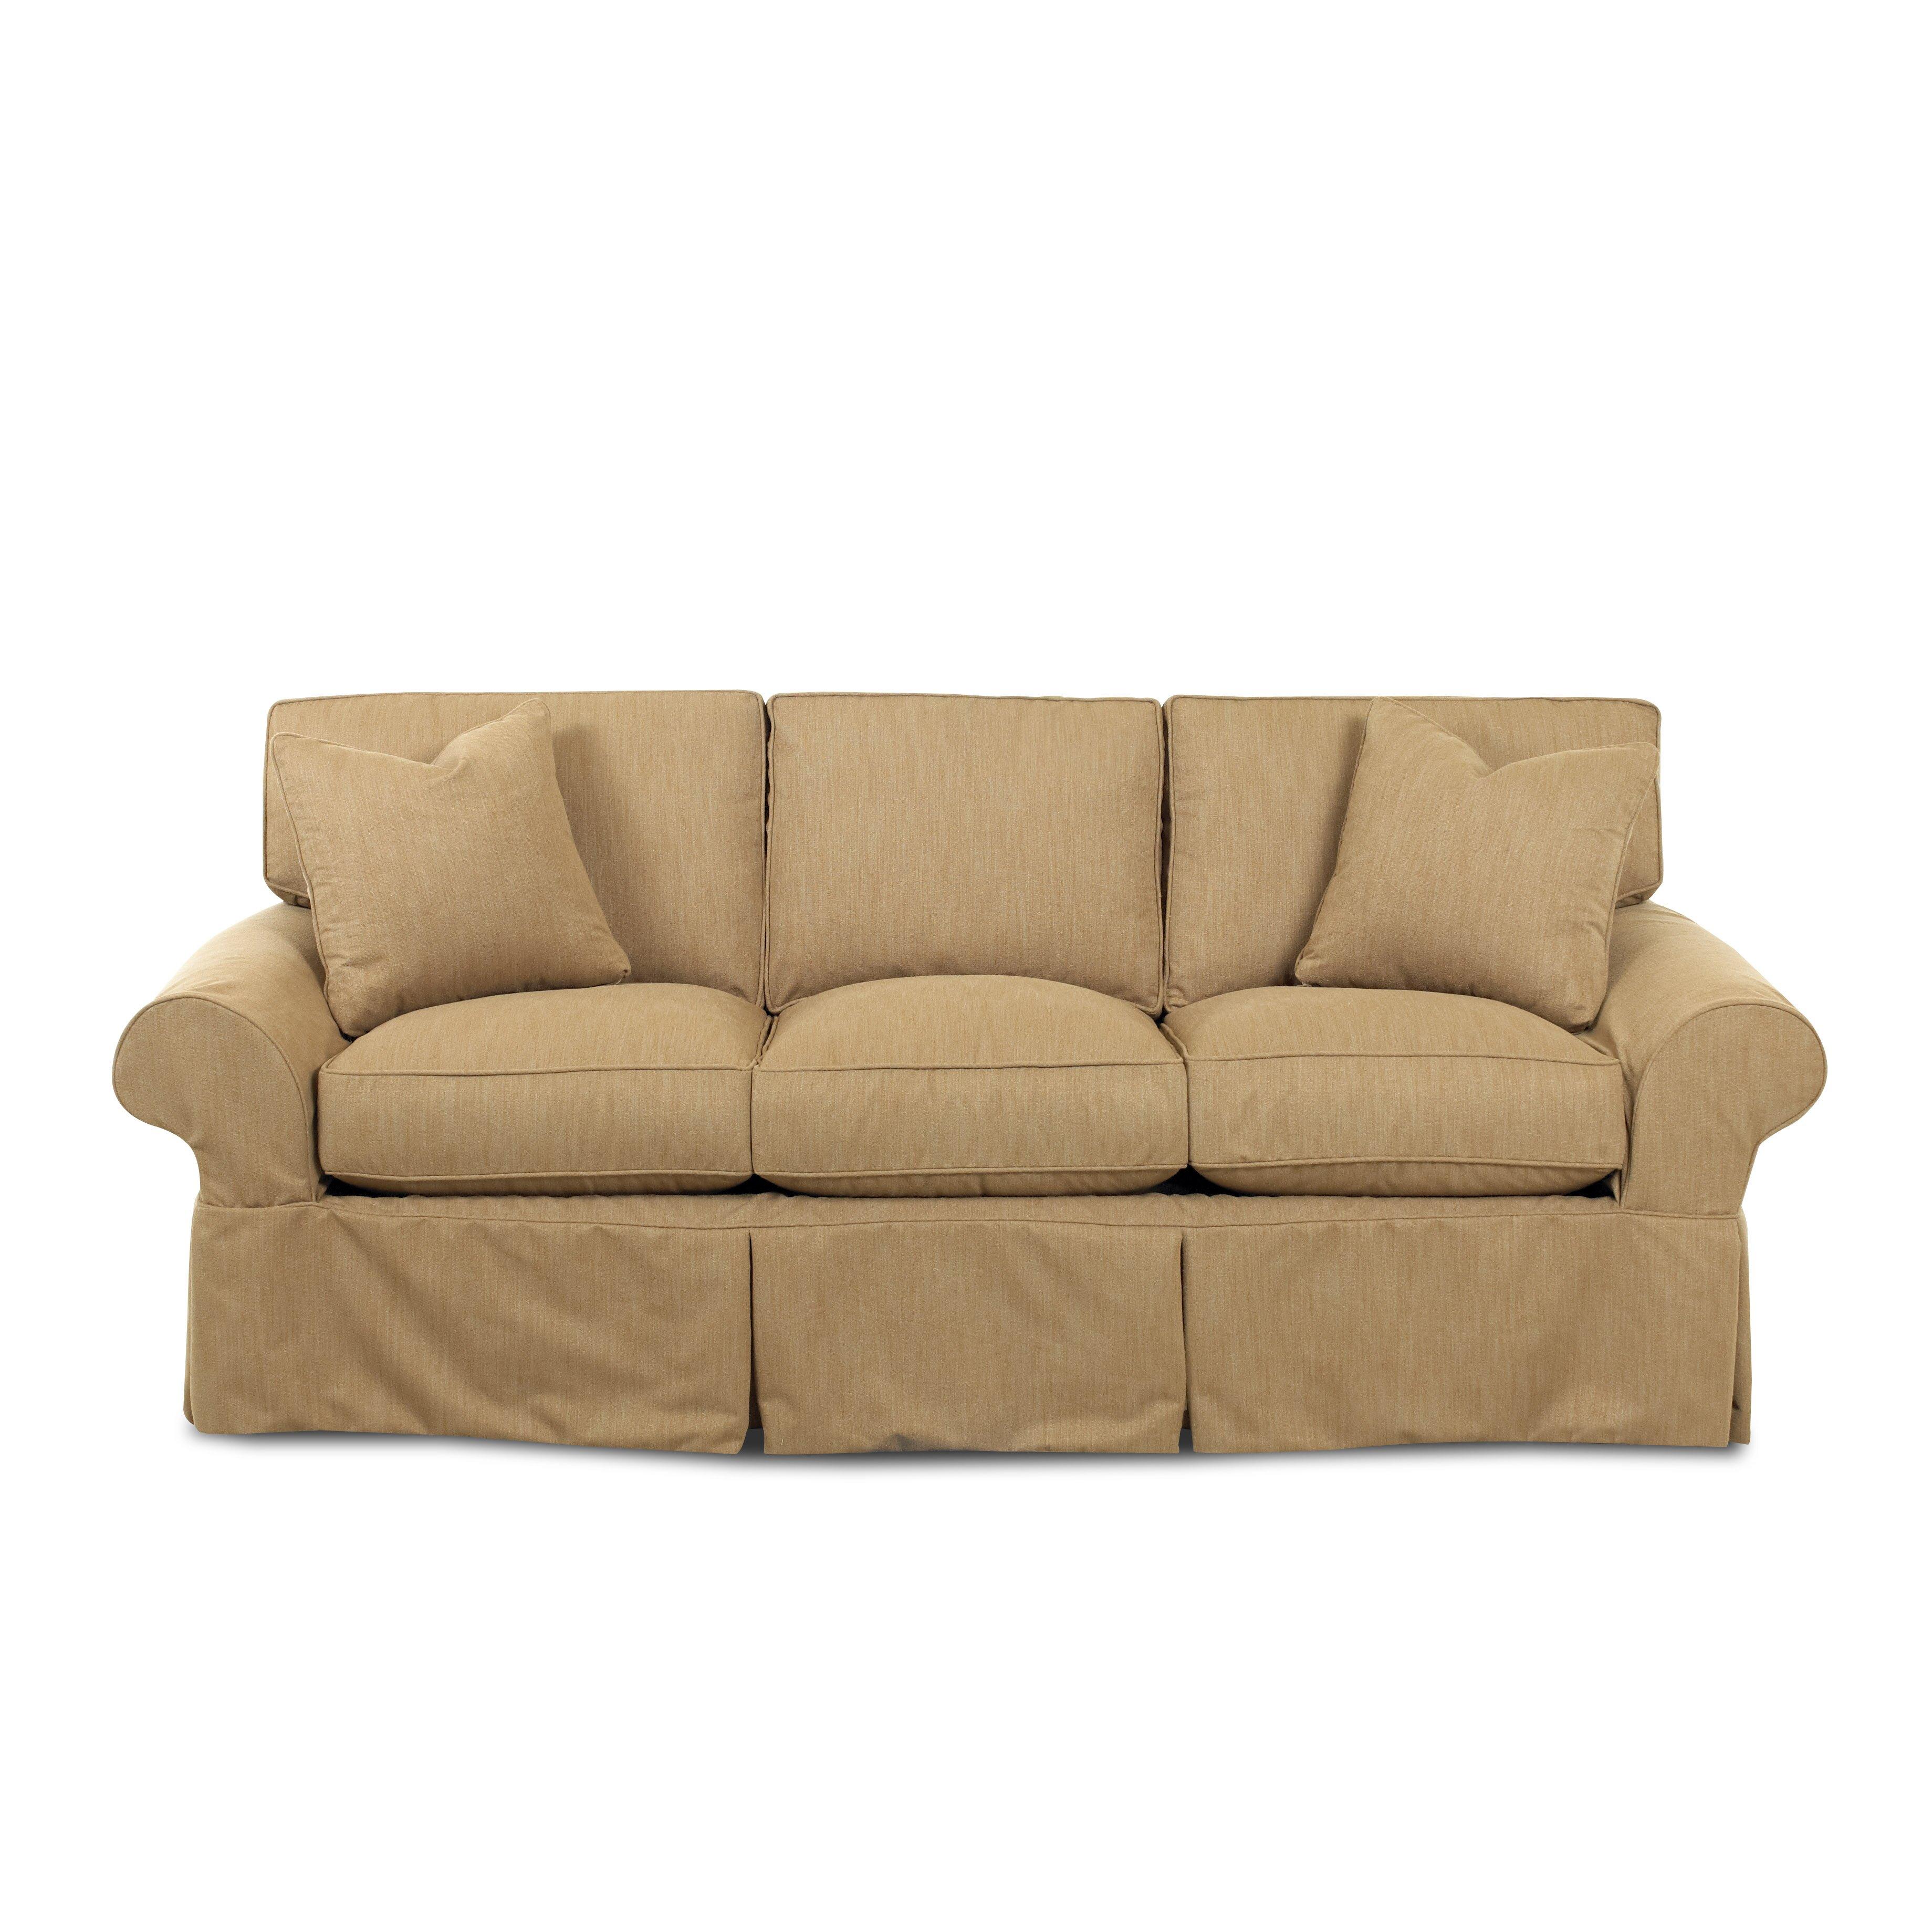 Klaussner furniture milton sofa wayfair for Klaussner sofa